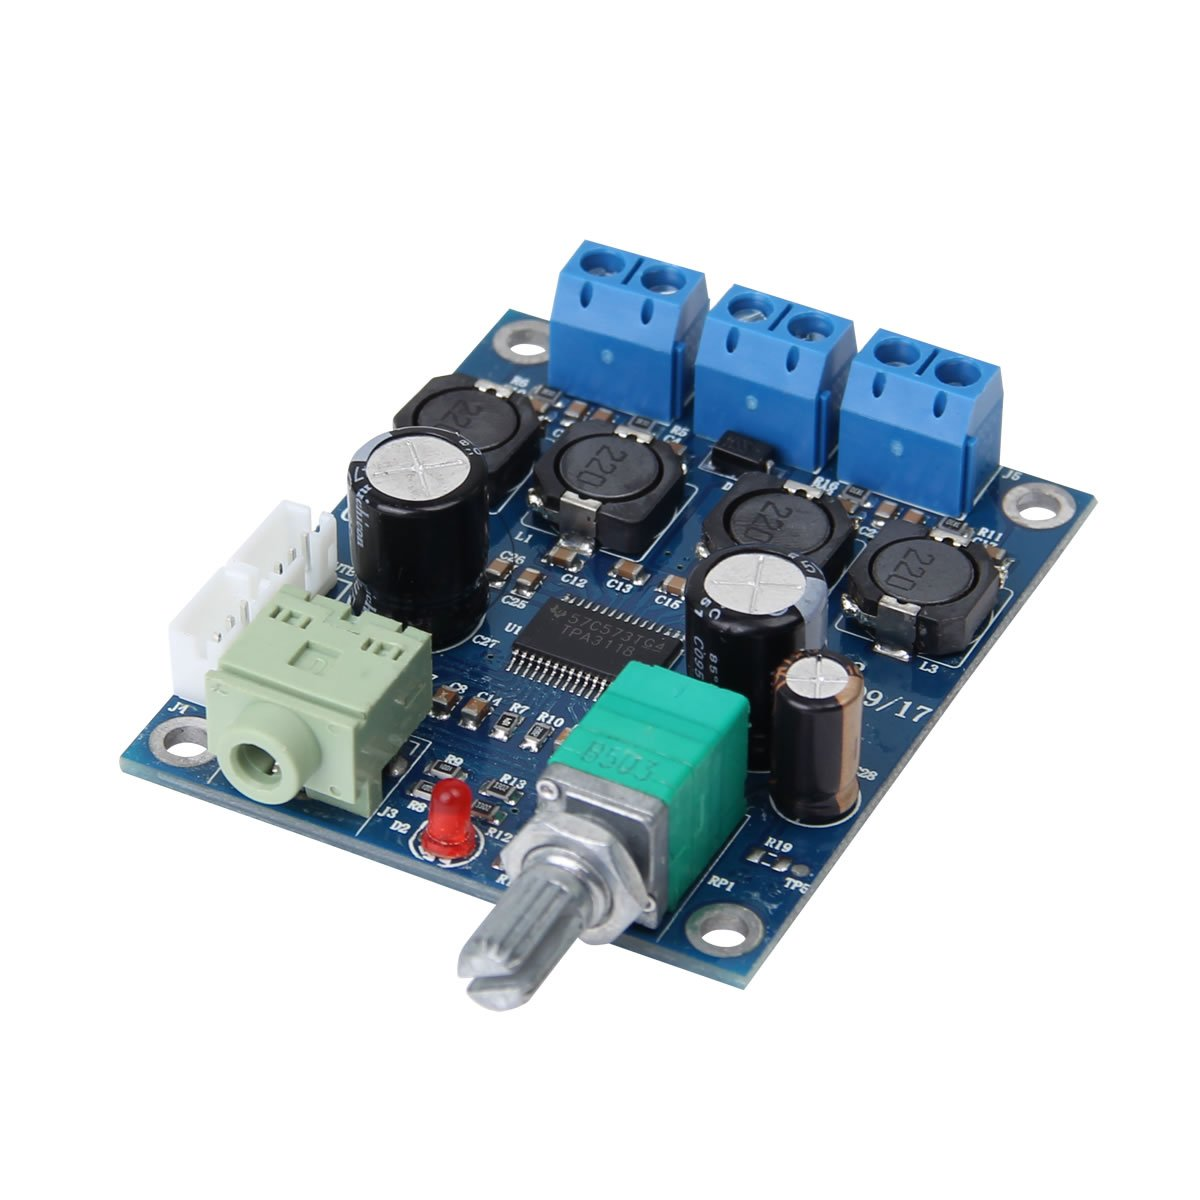 25w Tpa3118 Digital Mini Audio 12v Power Amplifier Module Class D Circuit Tpa3116d2 Tpa3118d2 Subwoofer Pcb Board Hi Fi Speakers